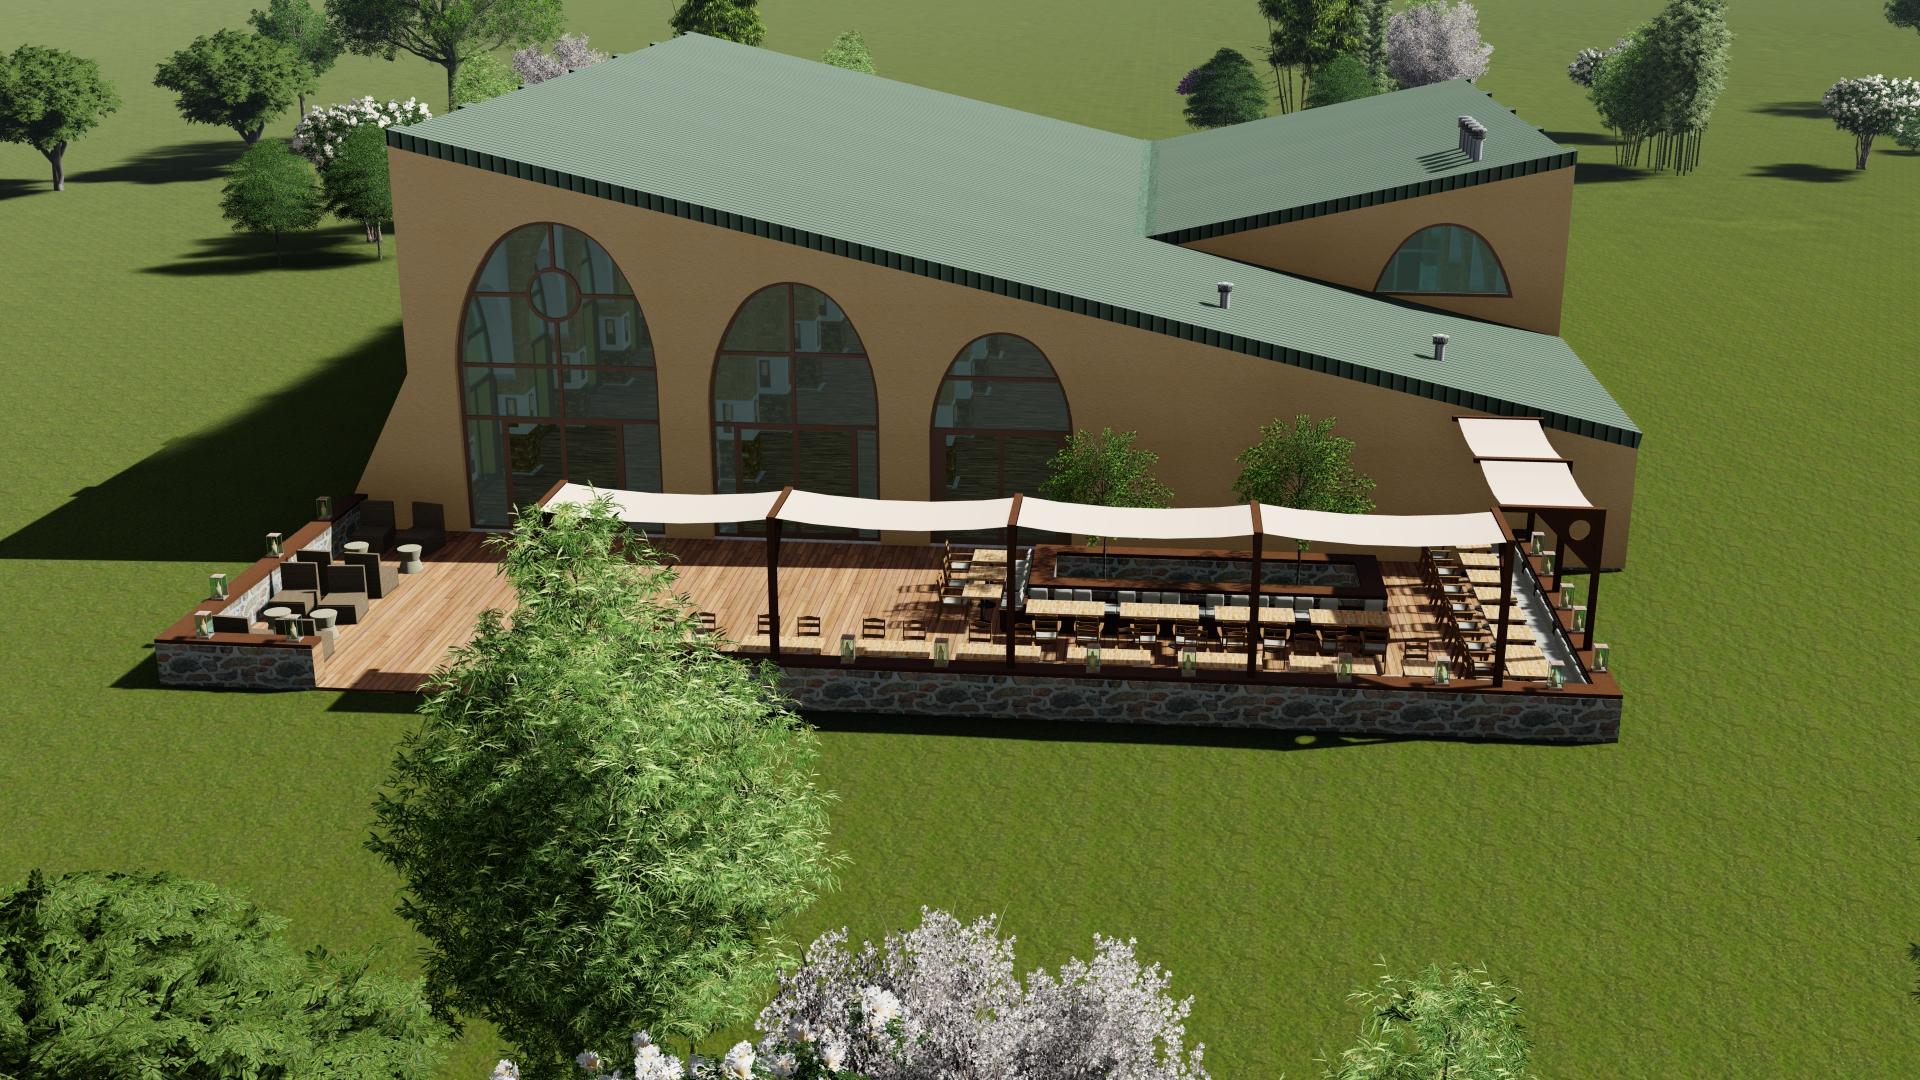 Doğa Oteli Kerpiç Restoran (16)